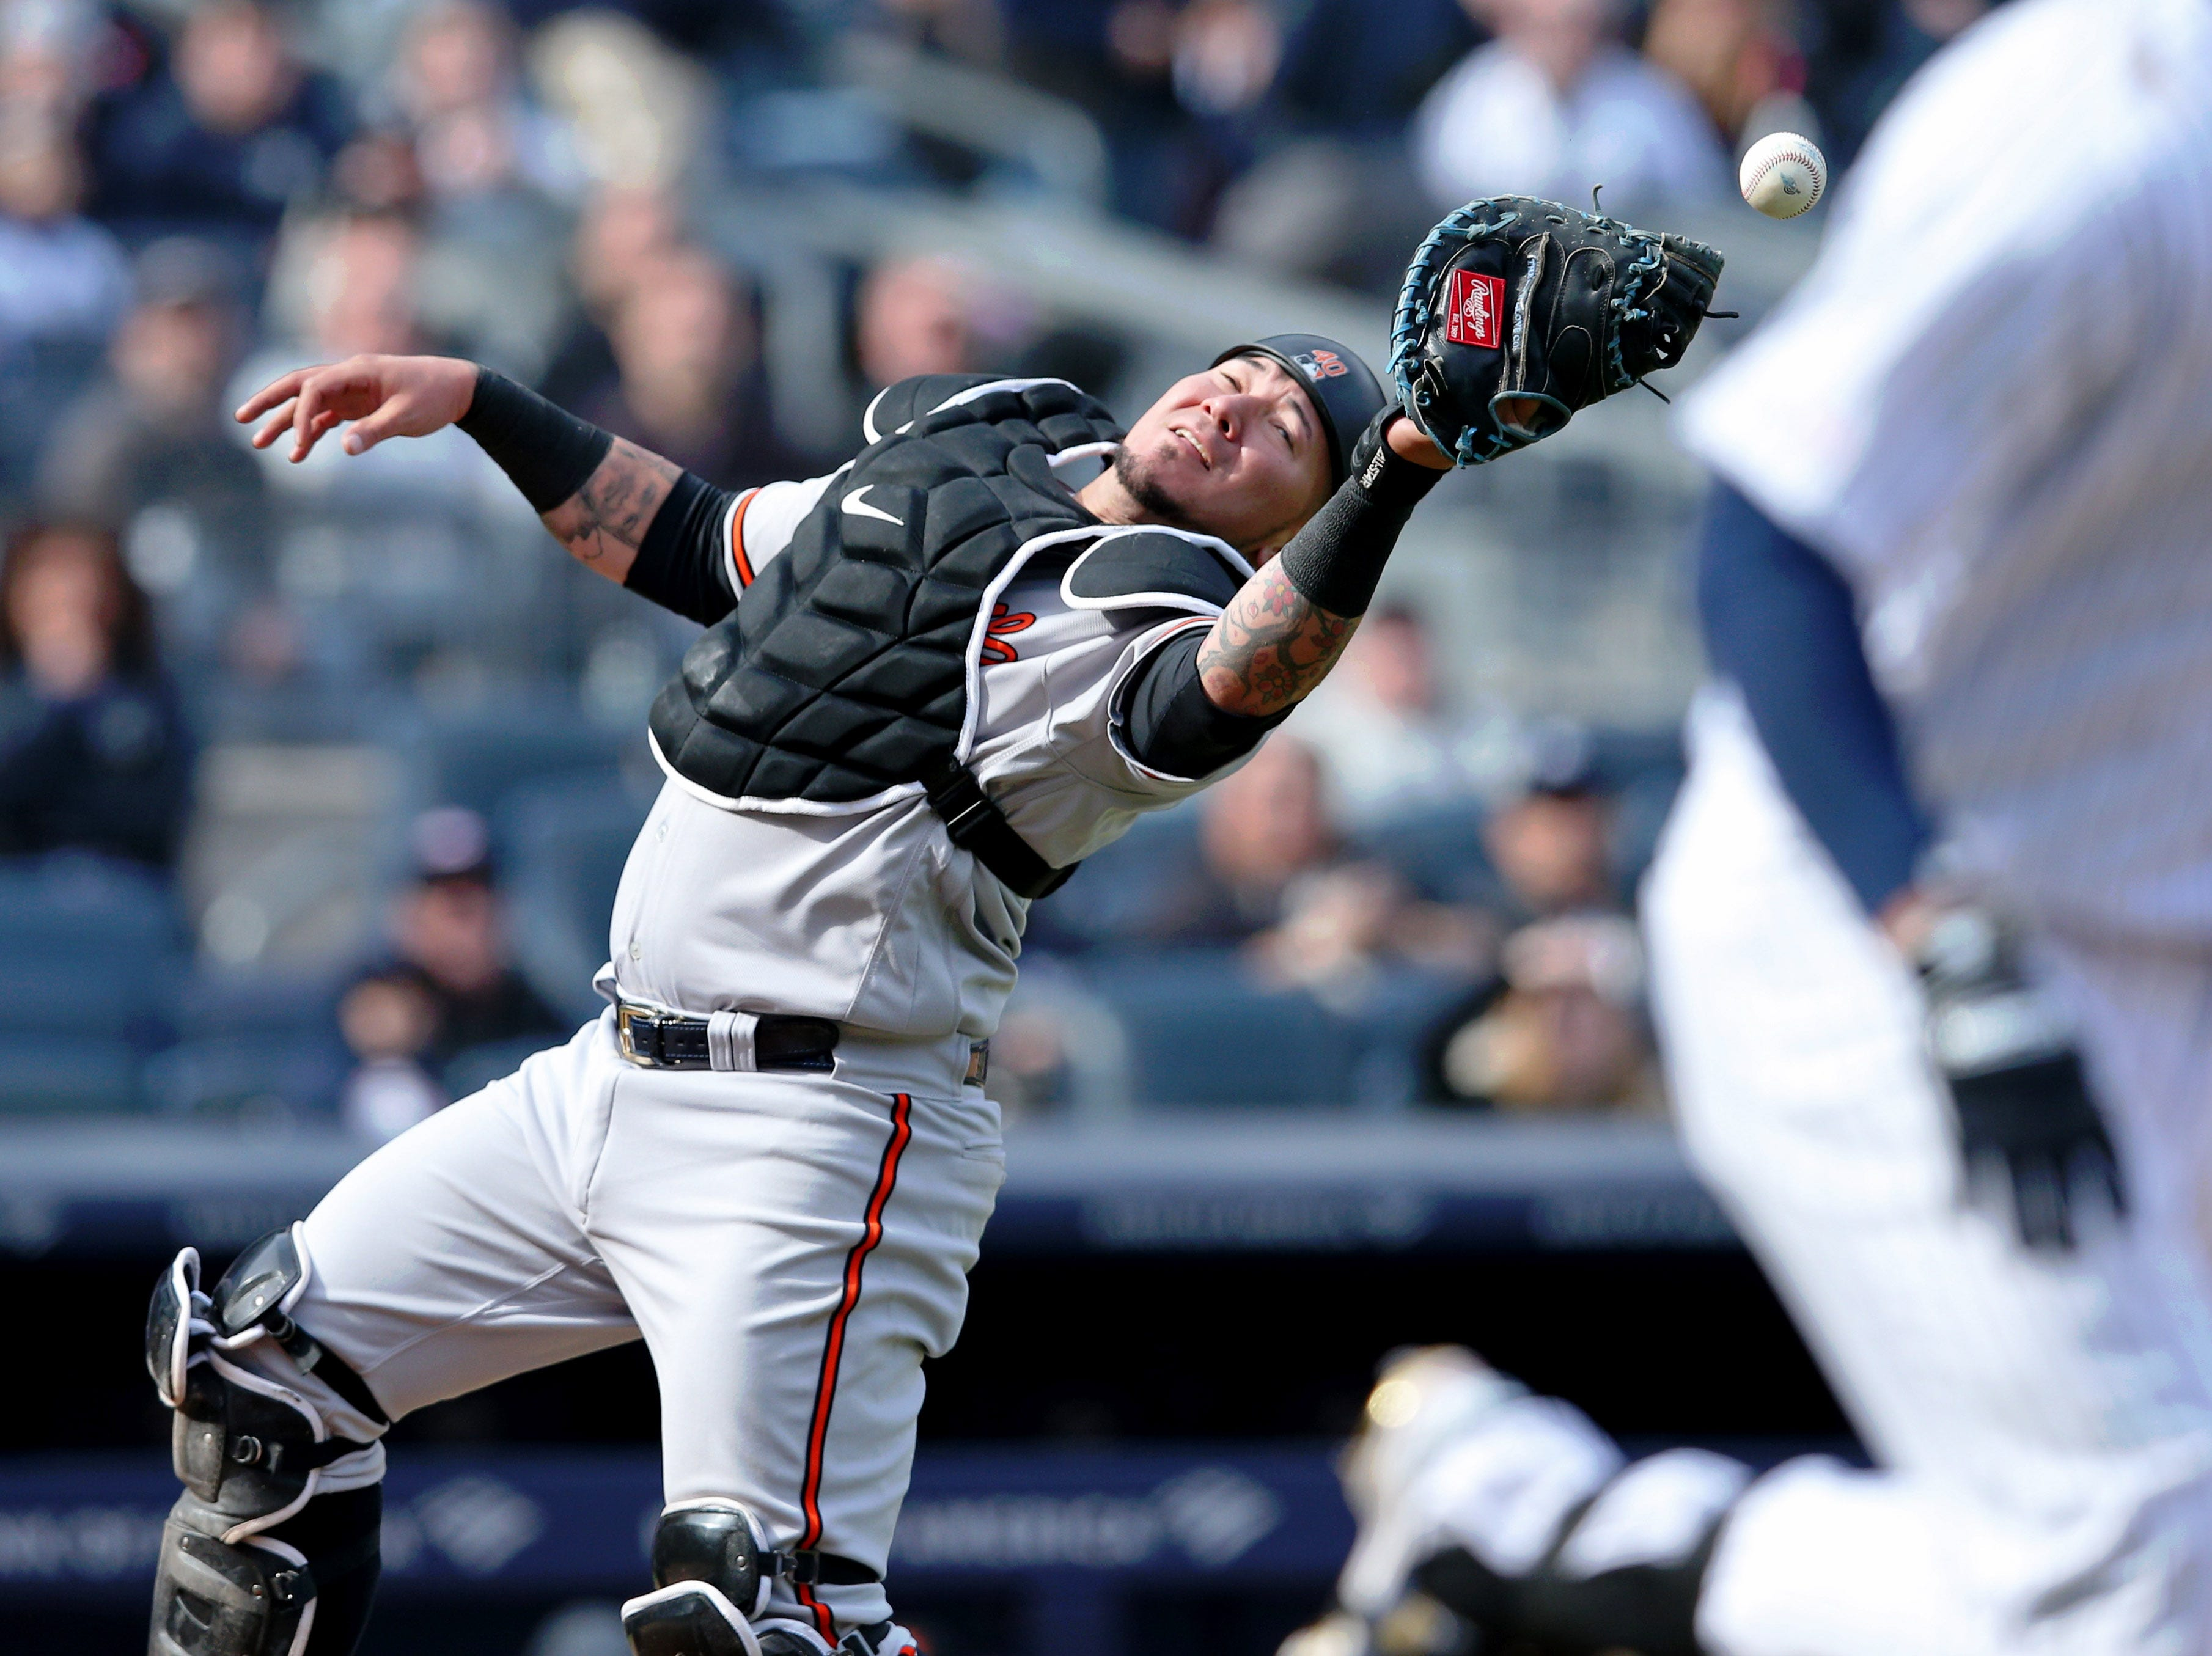 March 28: Orioles catcher Jesus Sucre drops a pop-up against the Yankees.